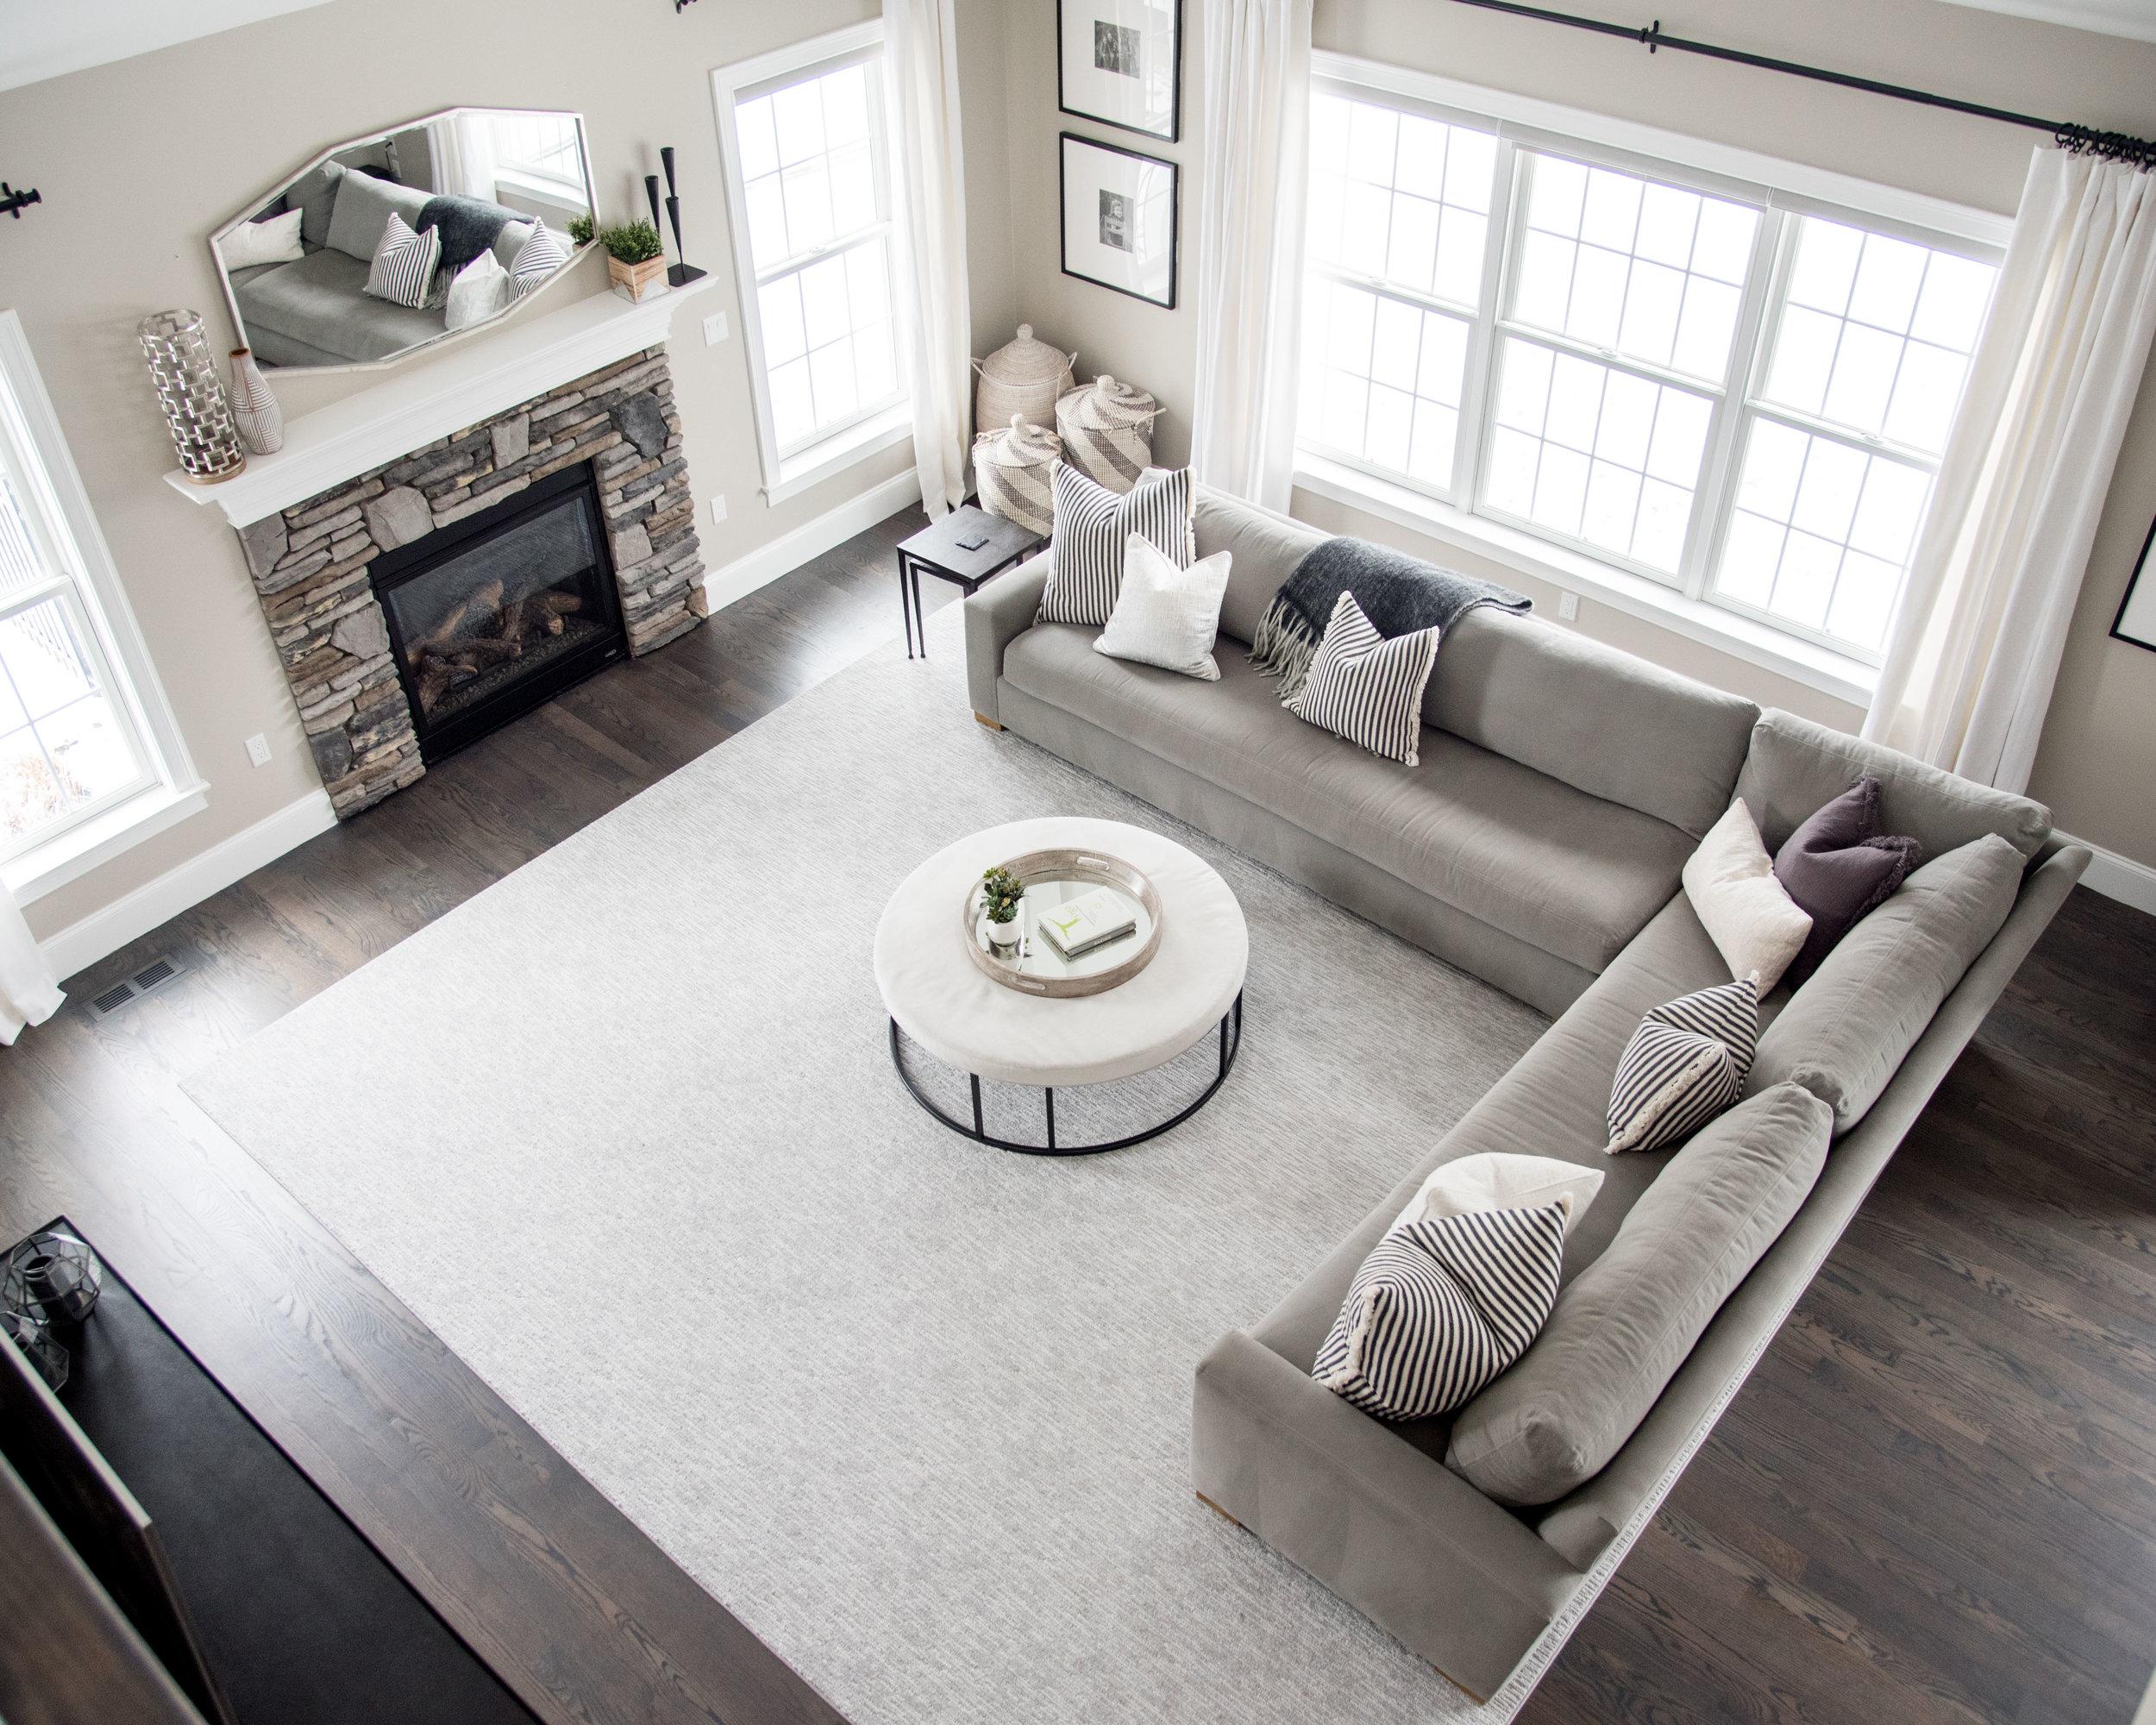 INTERIOR DESIGN BOSTON GINA BARAN INTERIORS AND DESIGN BEST NEWBURYPORT DESIGNERS LIVING ROOM FAMILY ROOM